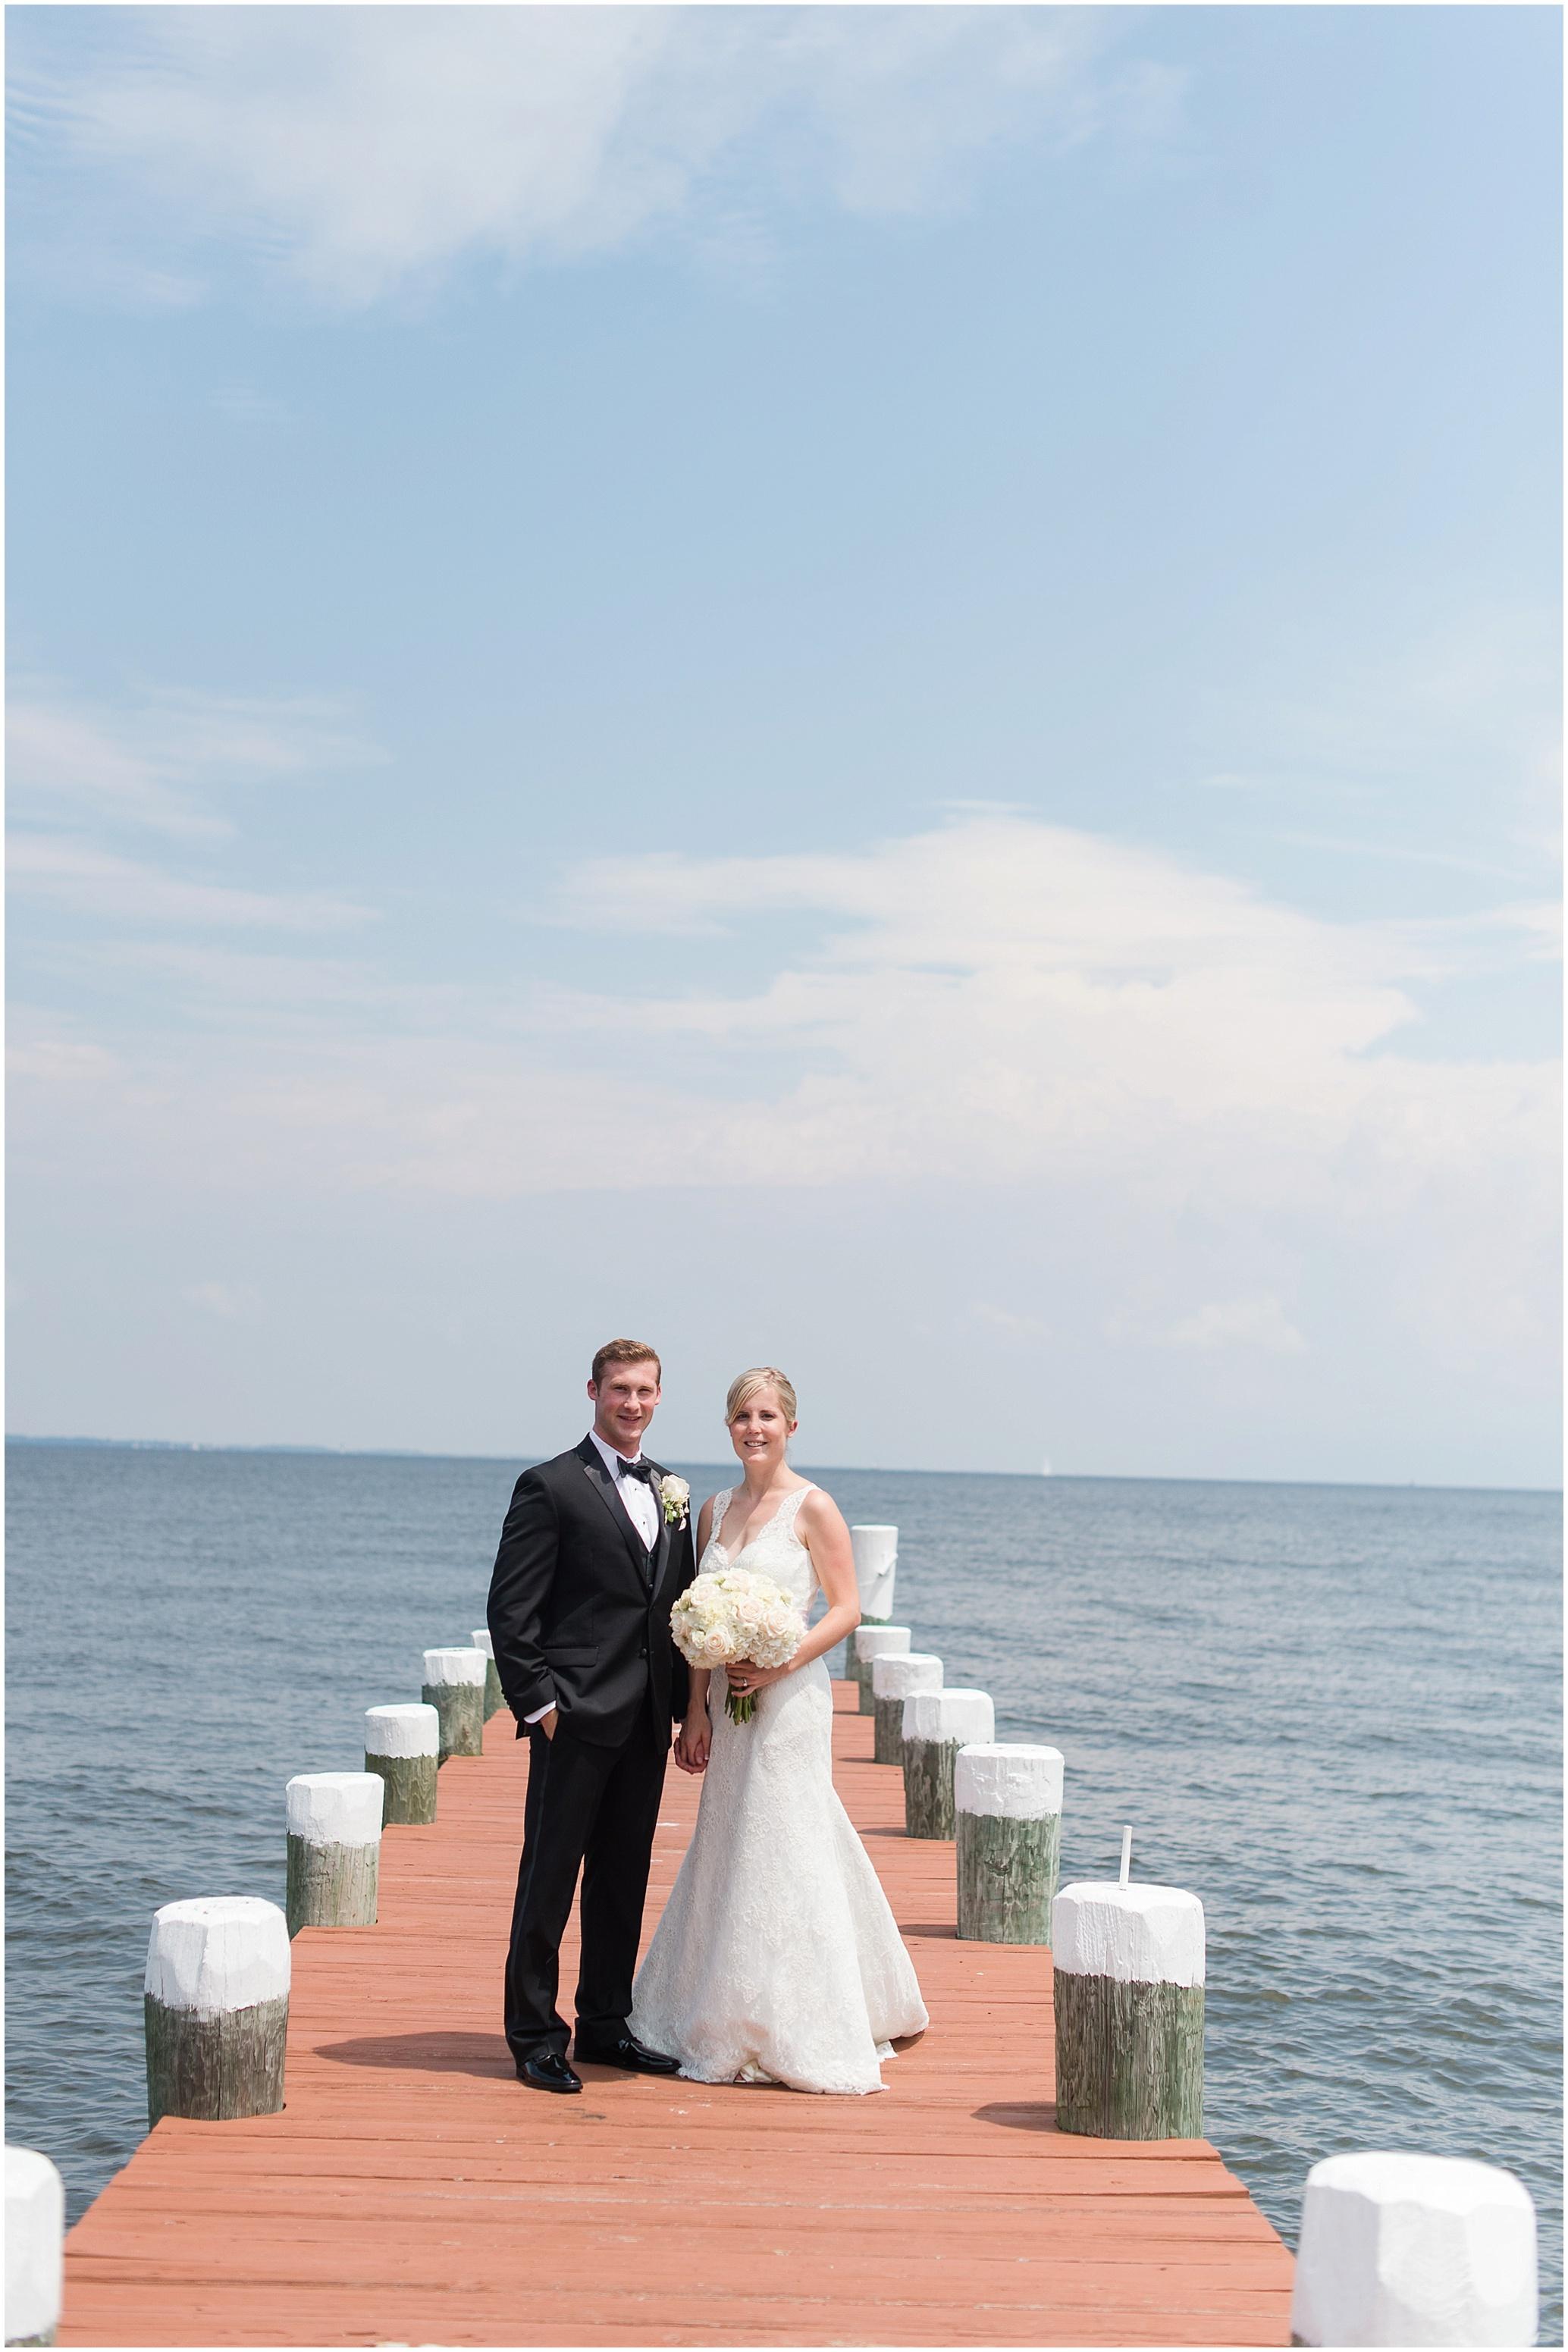 Hannah Leigh Photography Celebrations at the Bay Wedding_0994.jpg